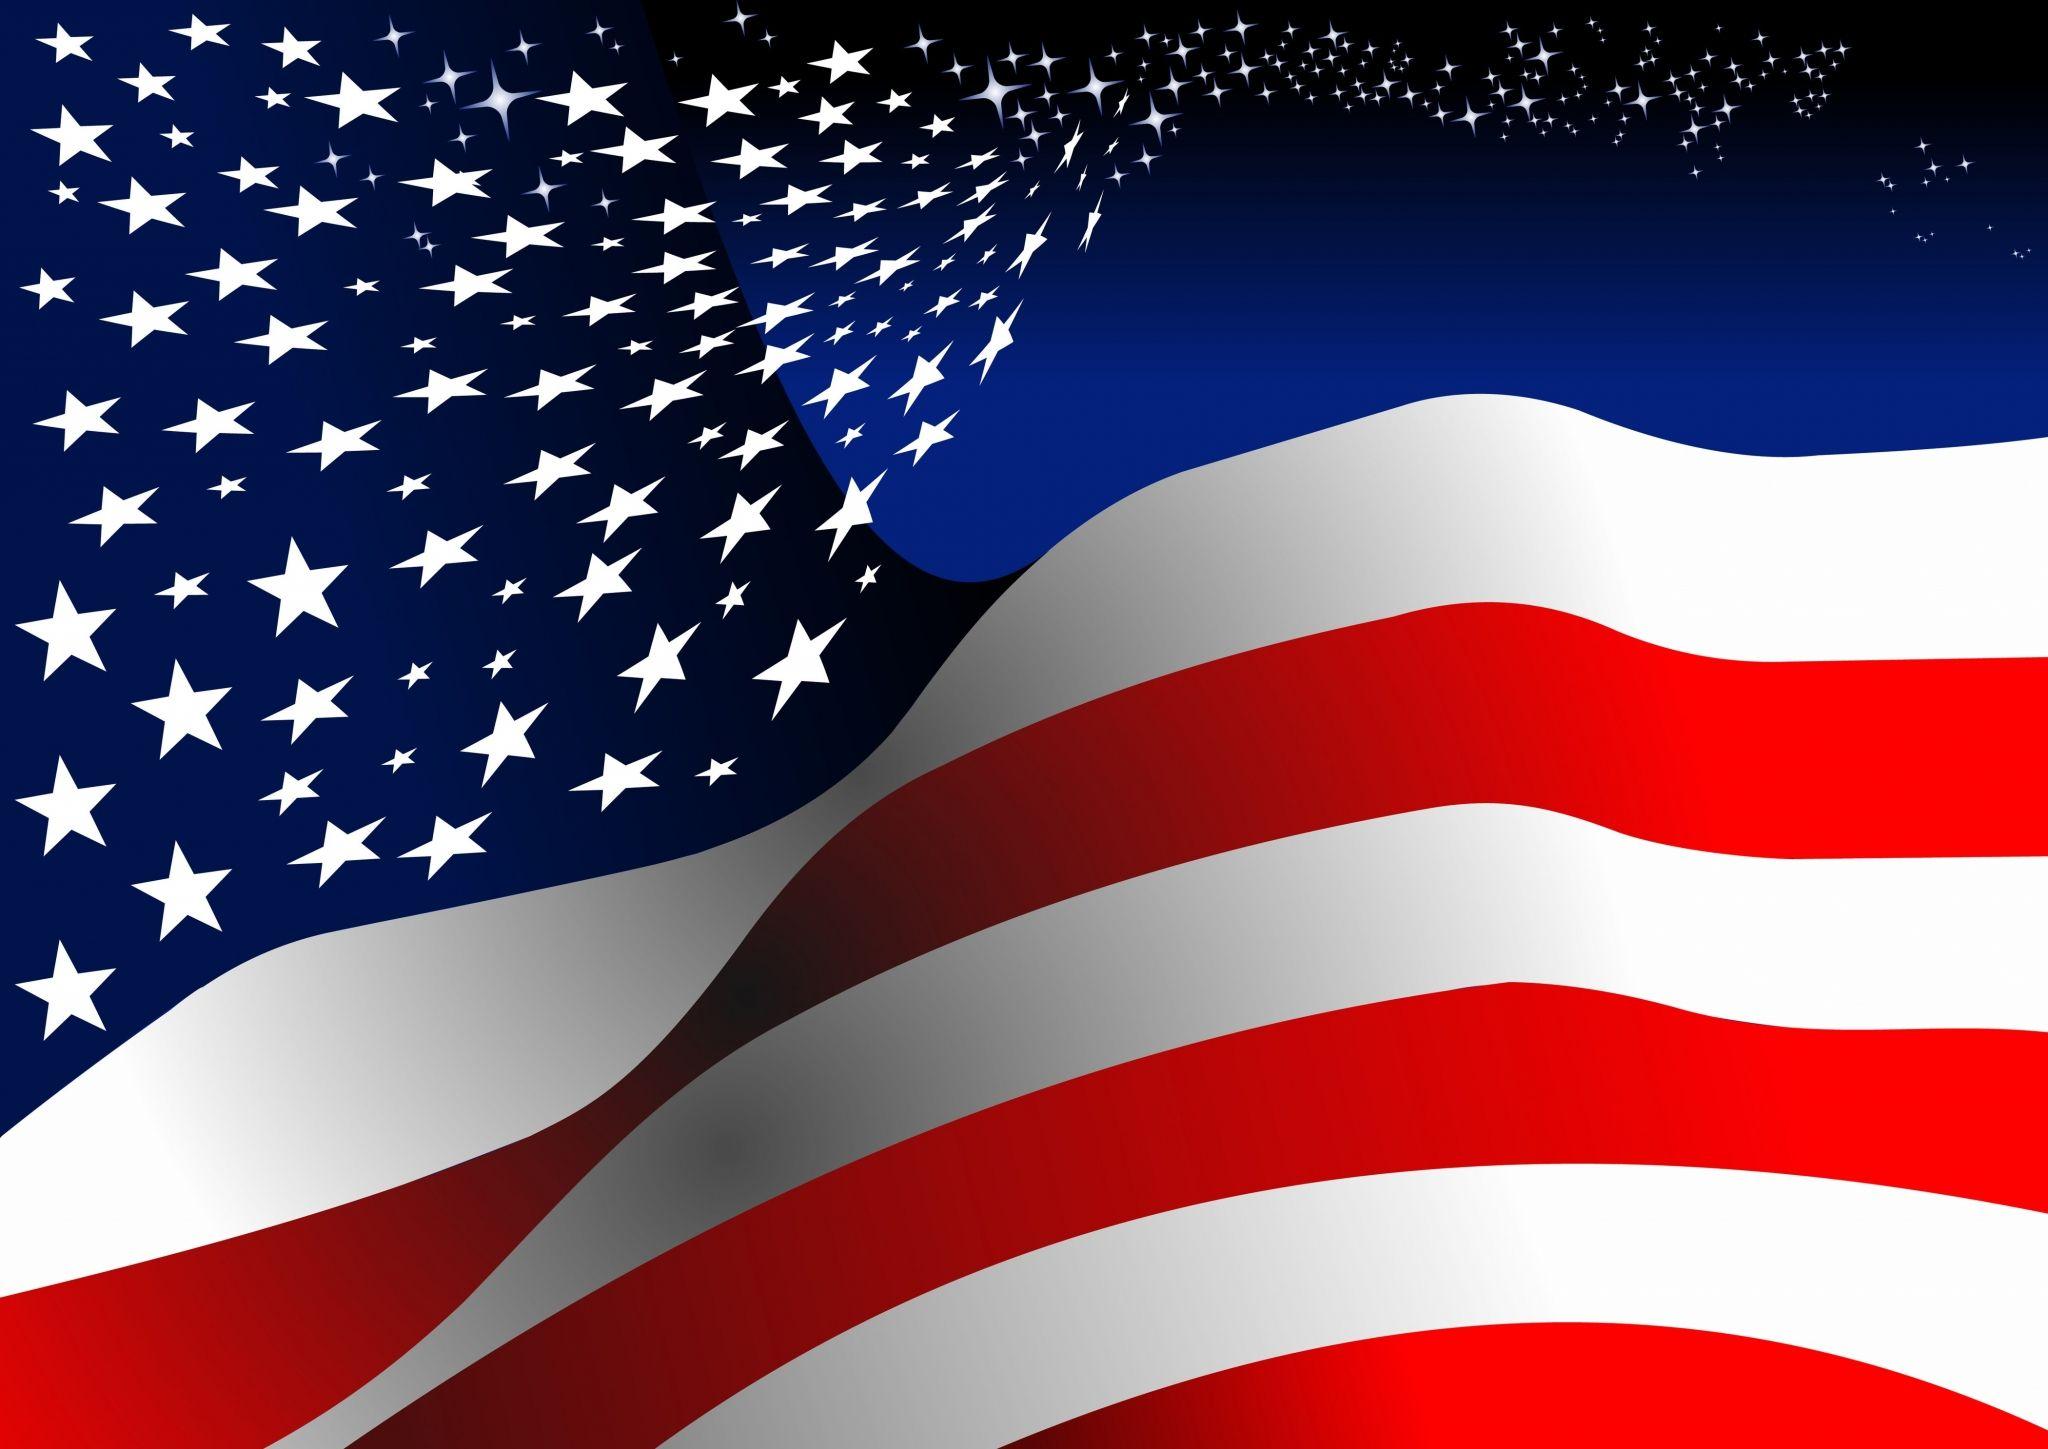 American Flag Free High Resolution Wallpaper American Flag Wallpaper American Flag Background United States Flag